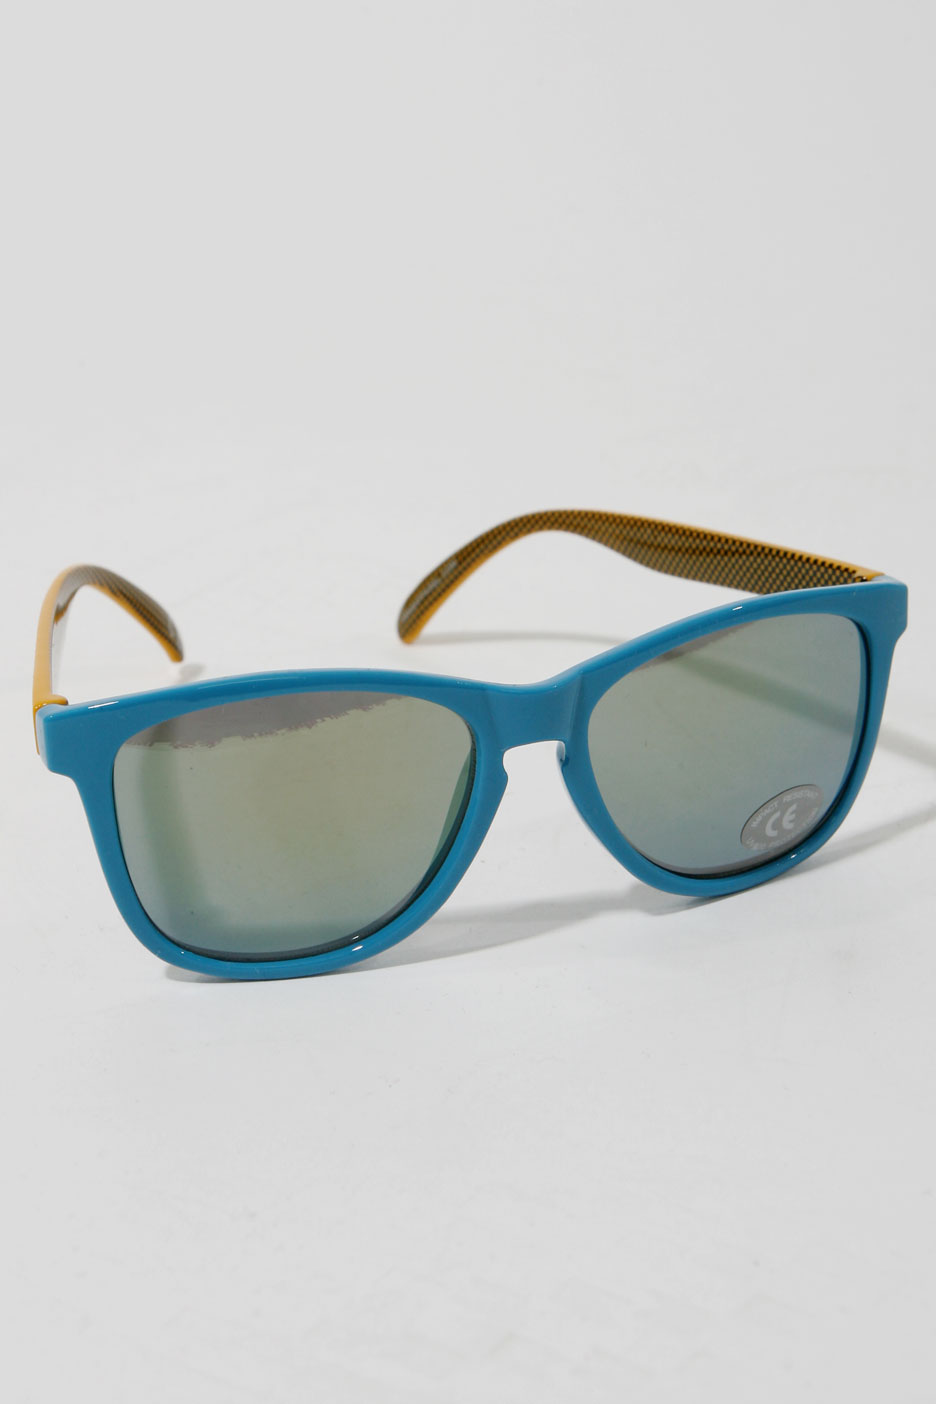 b424d77533c31c Vans - Spicoli 3 Shades New Blue Sun - Sunglasses - Impericon.com ...